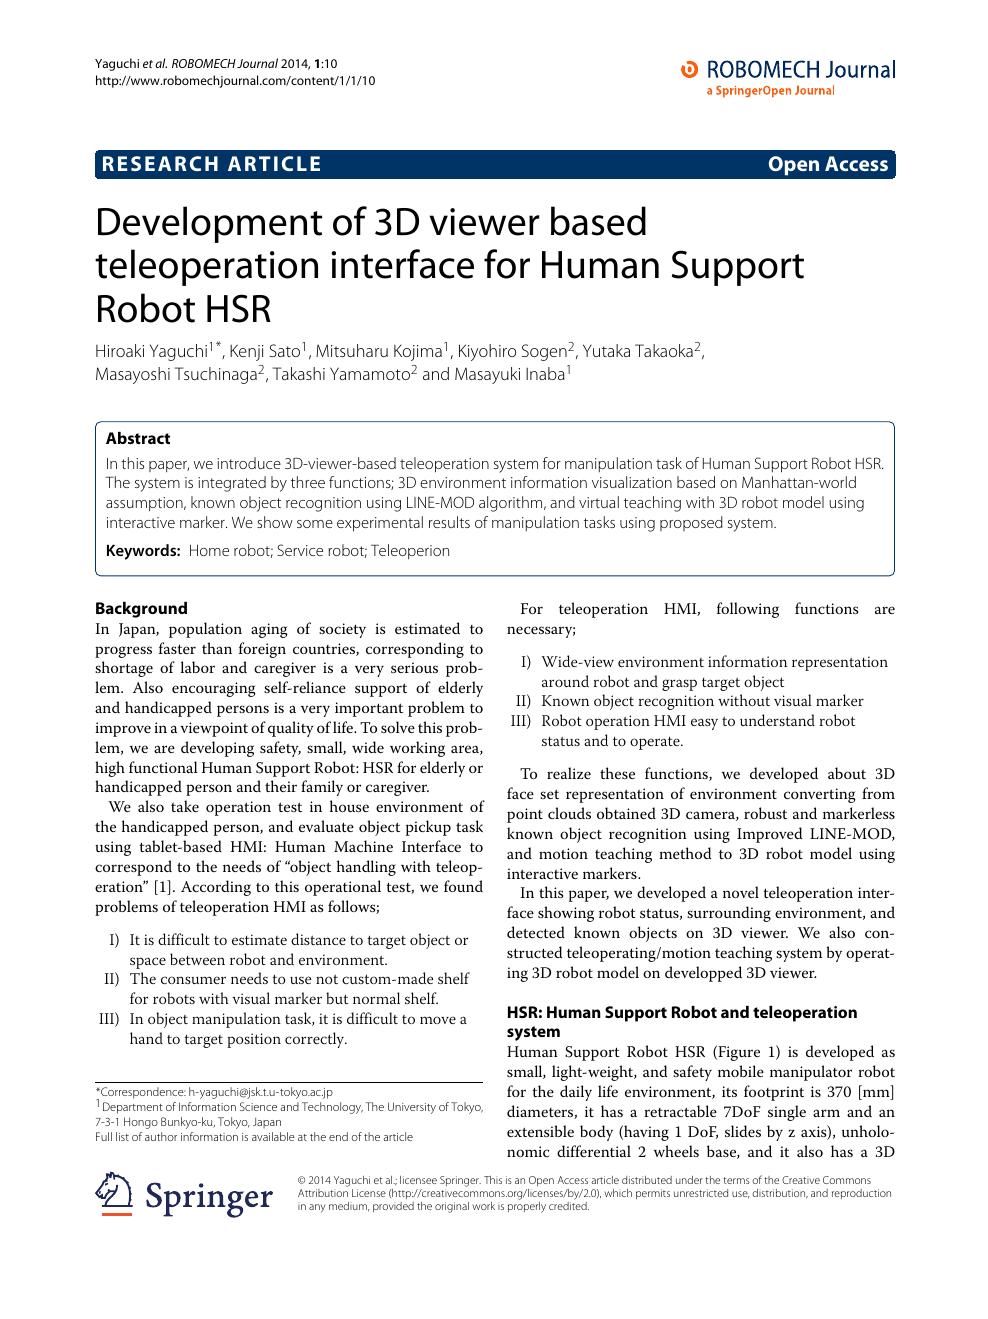 Development of 3D viewer based teleoperation interface for